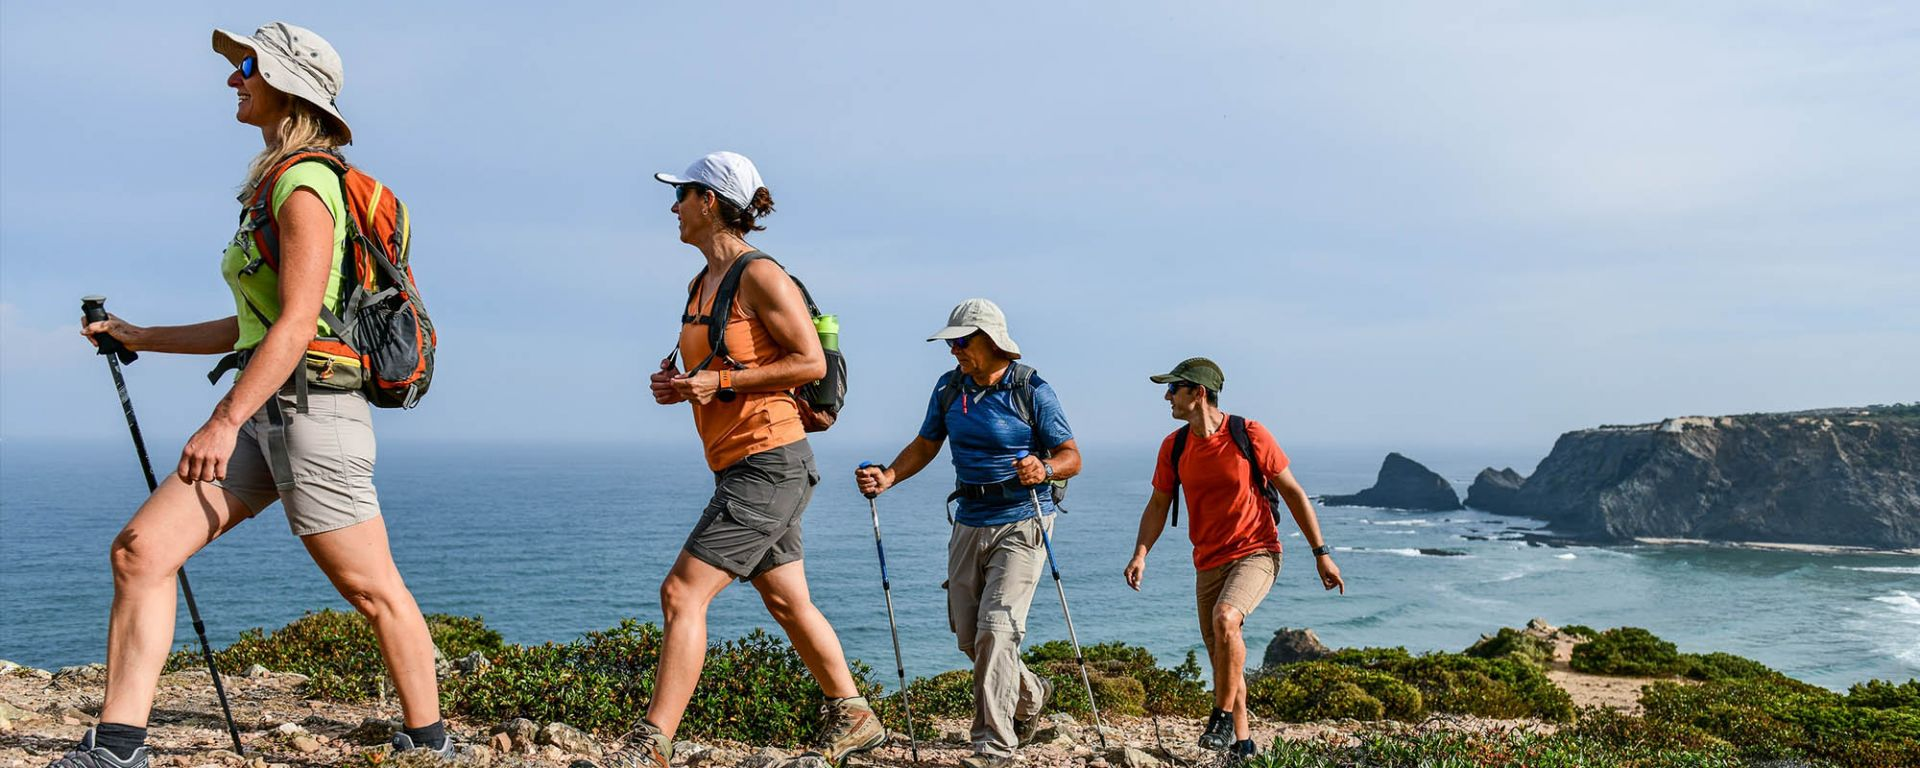 Portugal Walking Tour Southwest Coast Header